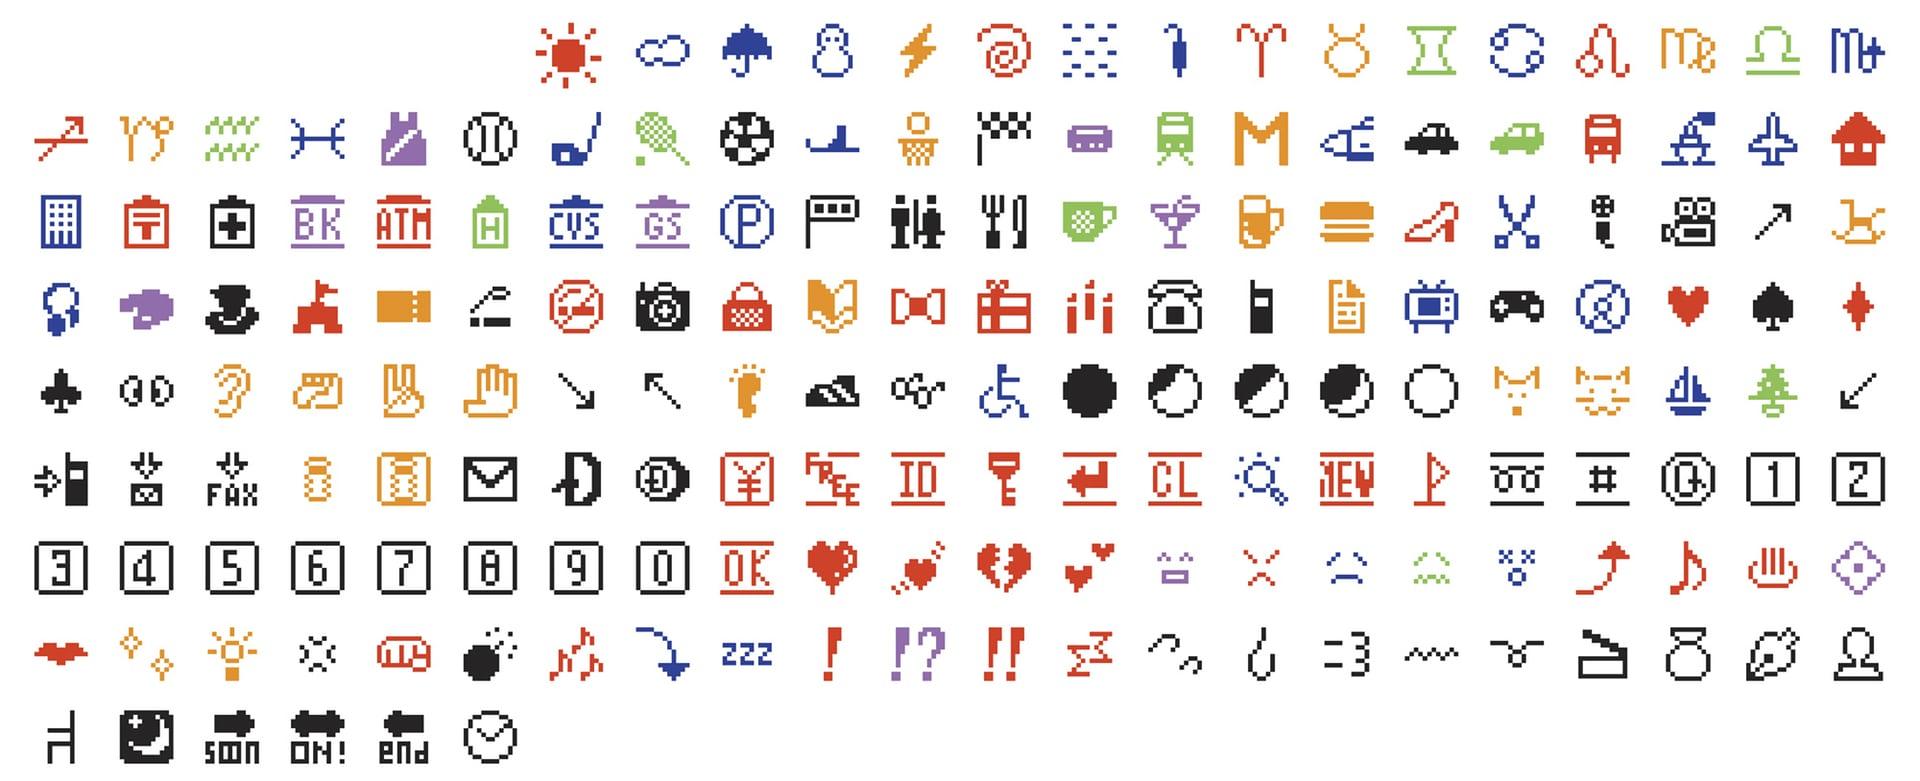 Original 176 emojis